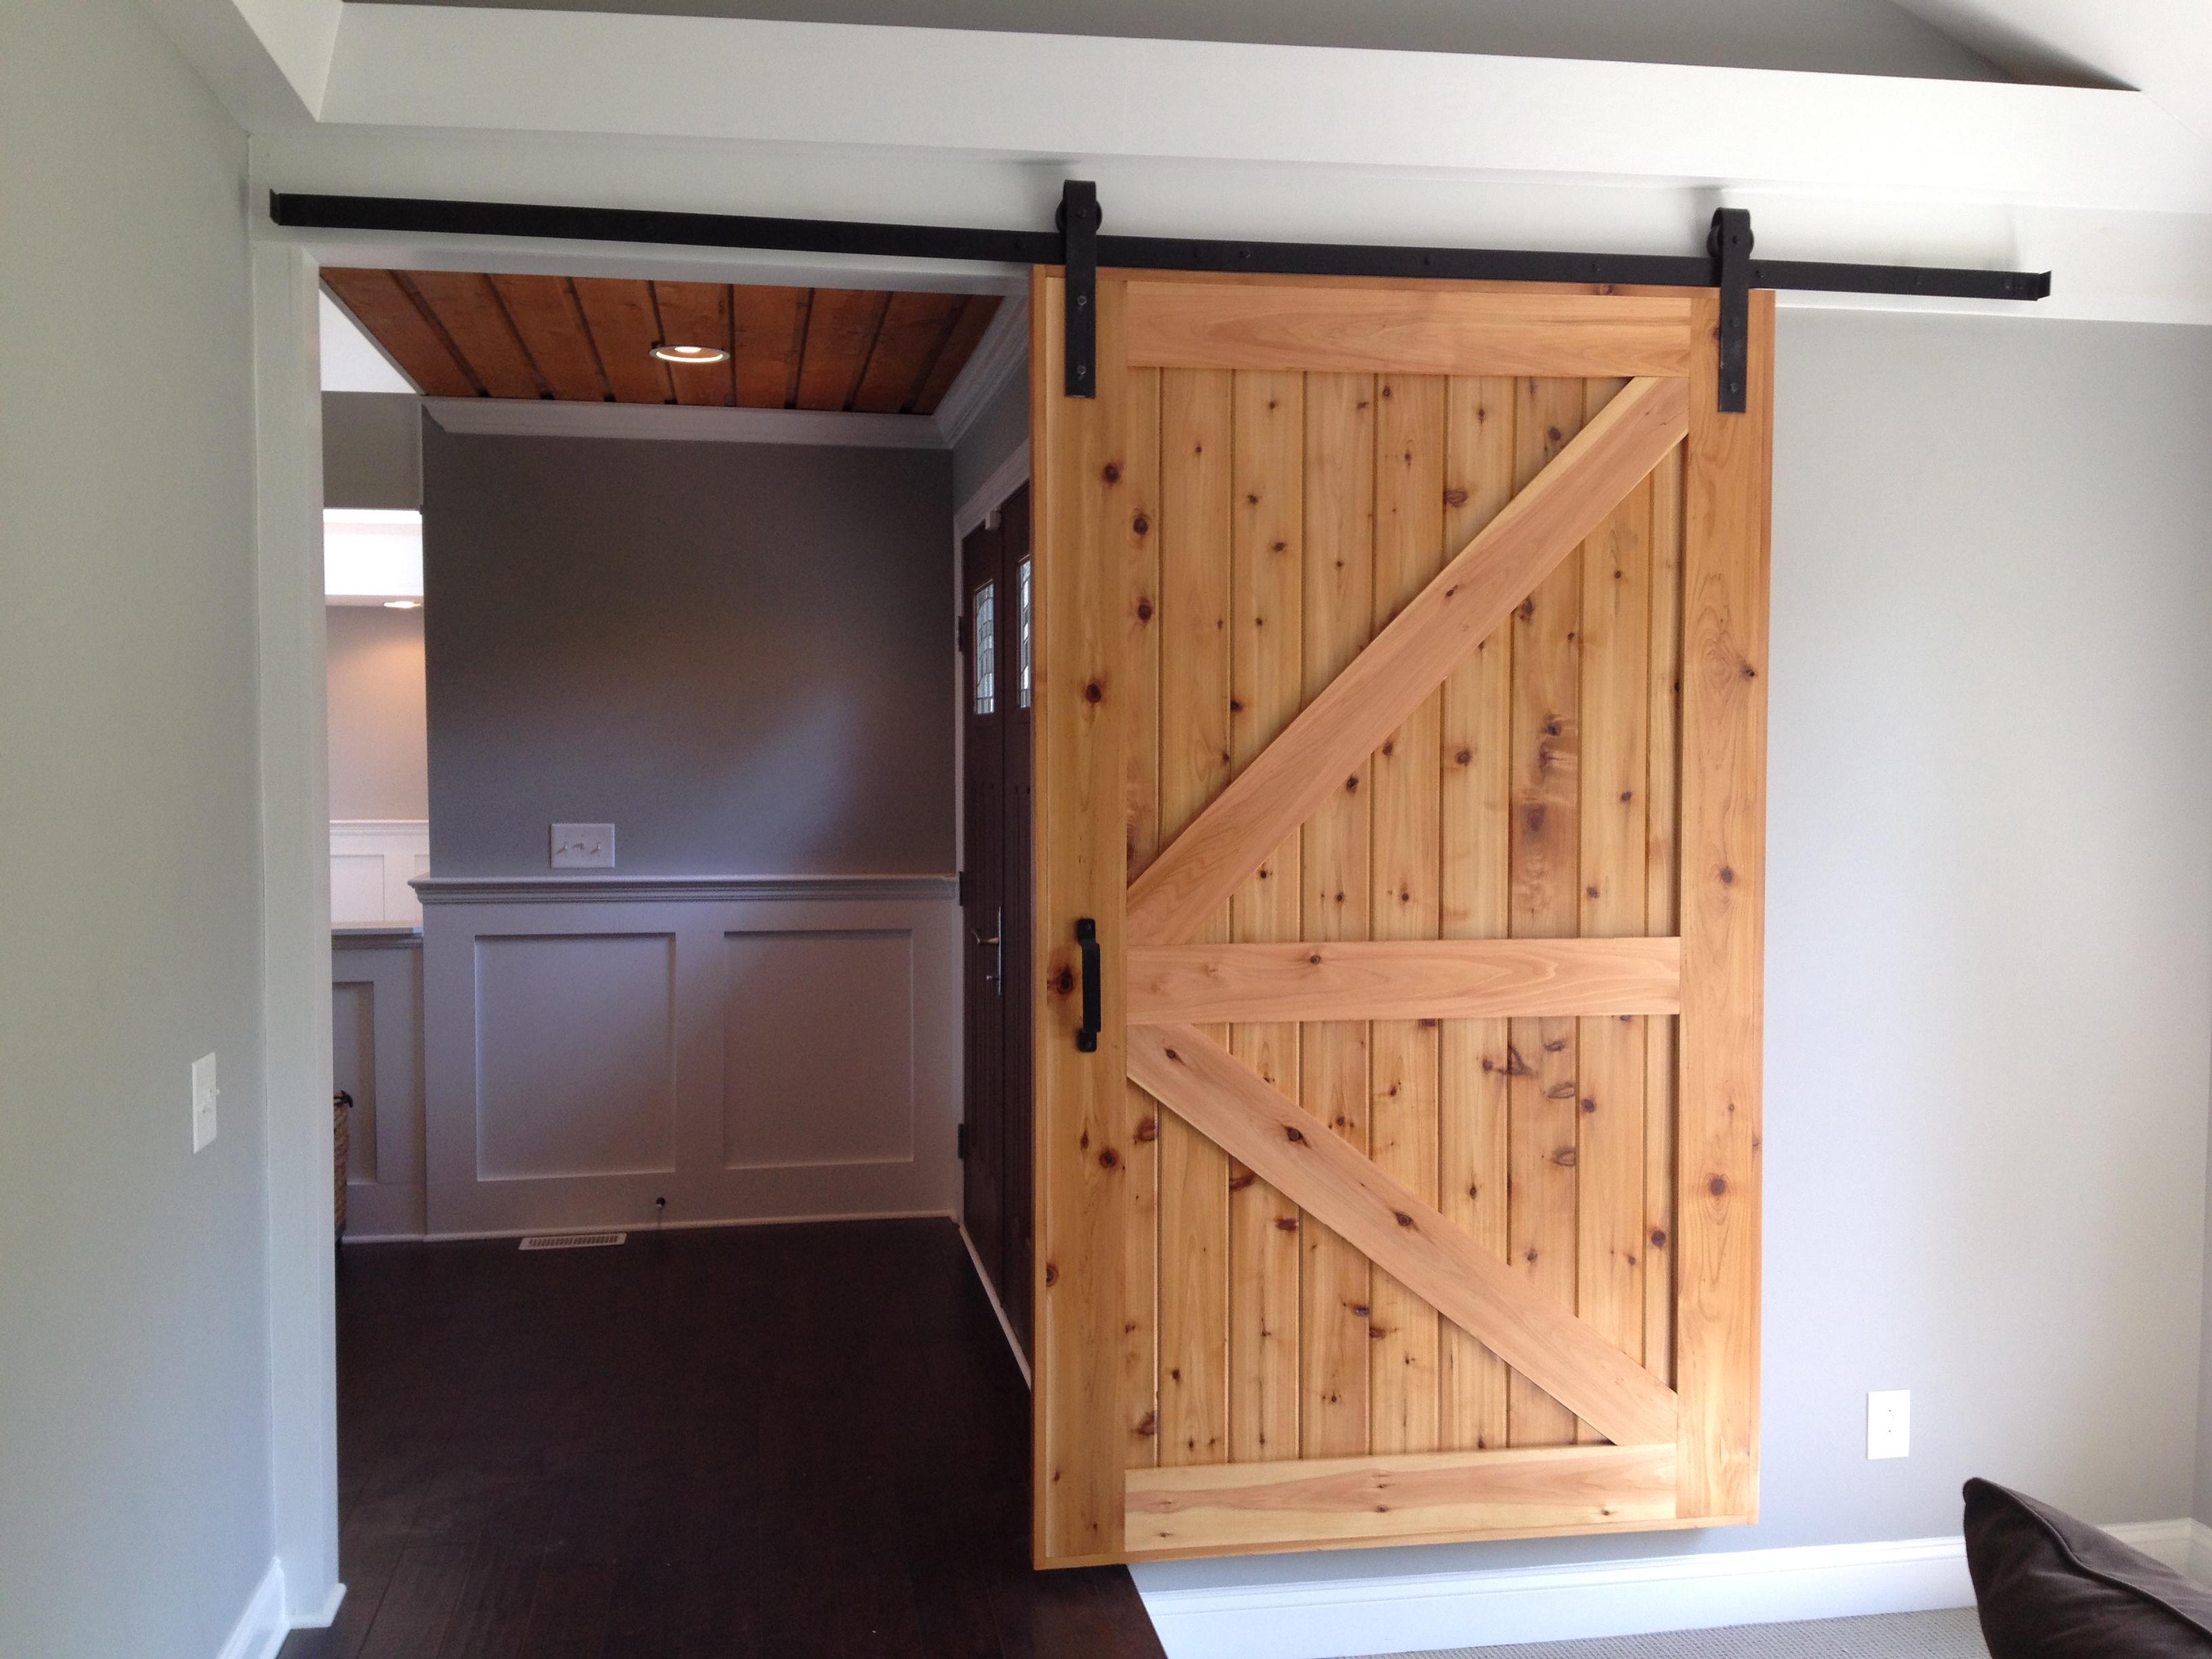 Custom Built Cedar Barn Door & Custom Door - Lake Norman NC - Henderson Building Group